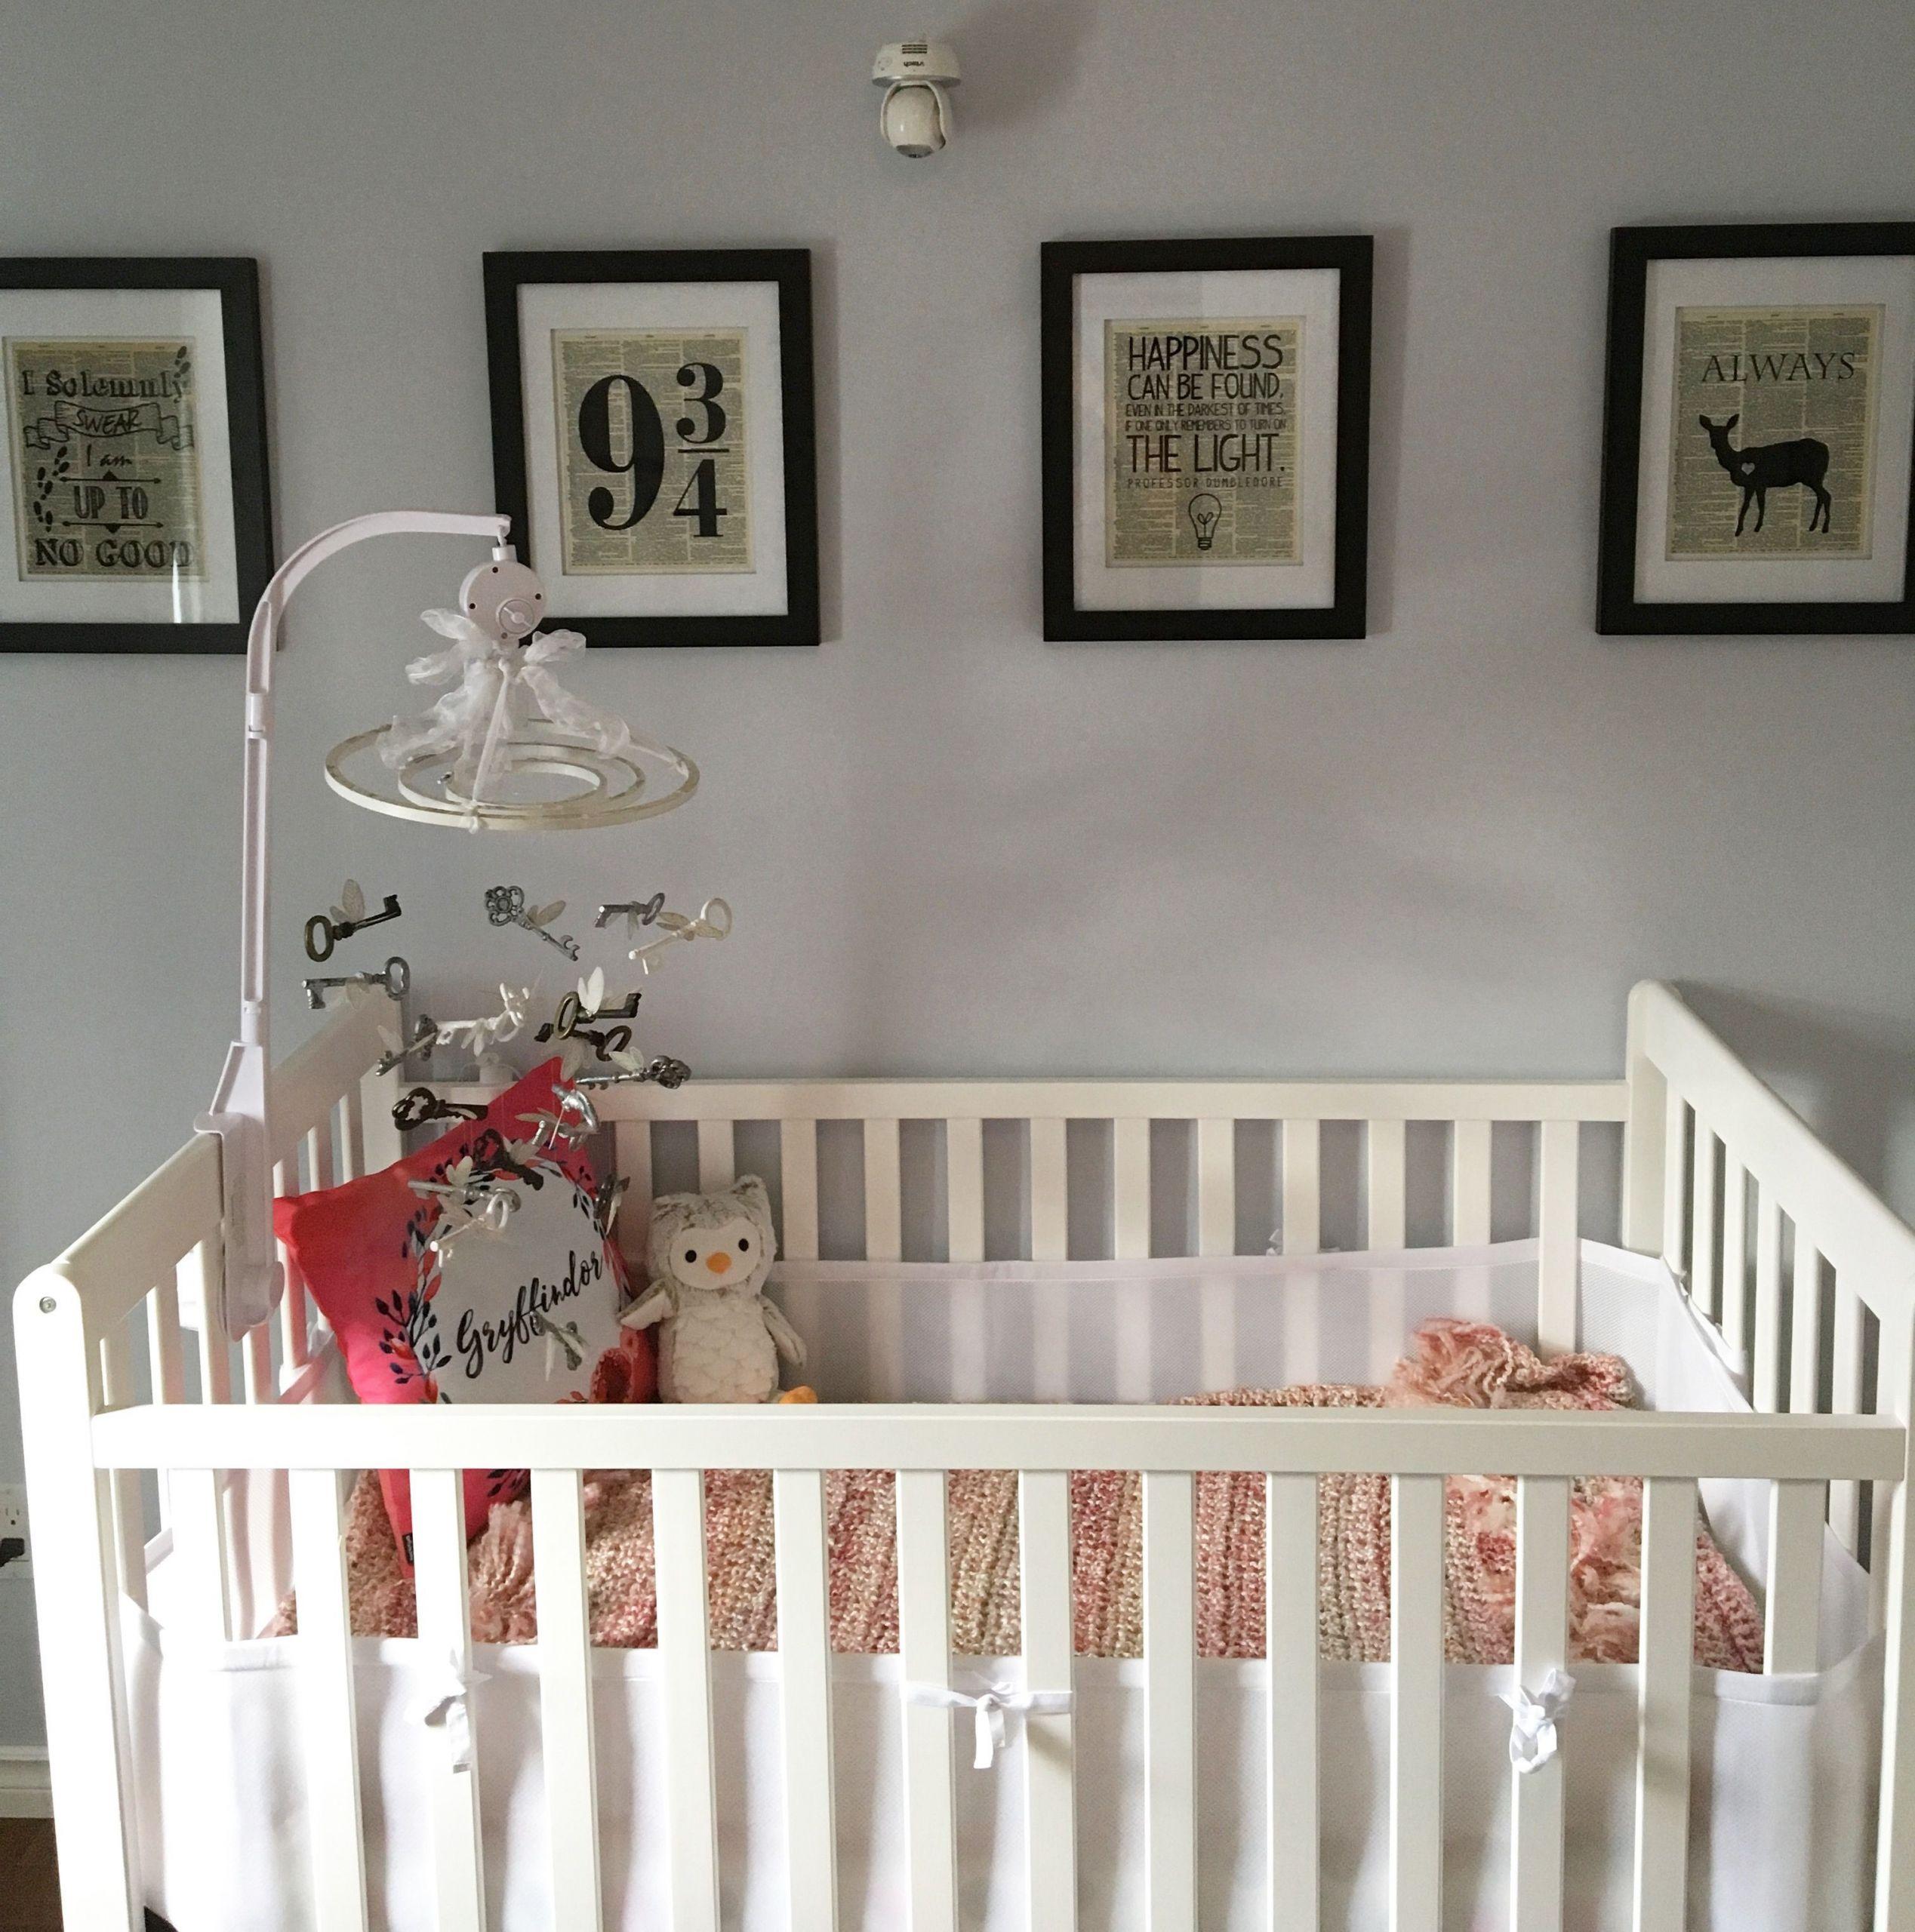 Harry Potter Baby Room Decor  Harry Potter themed nursery for my baby girl